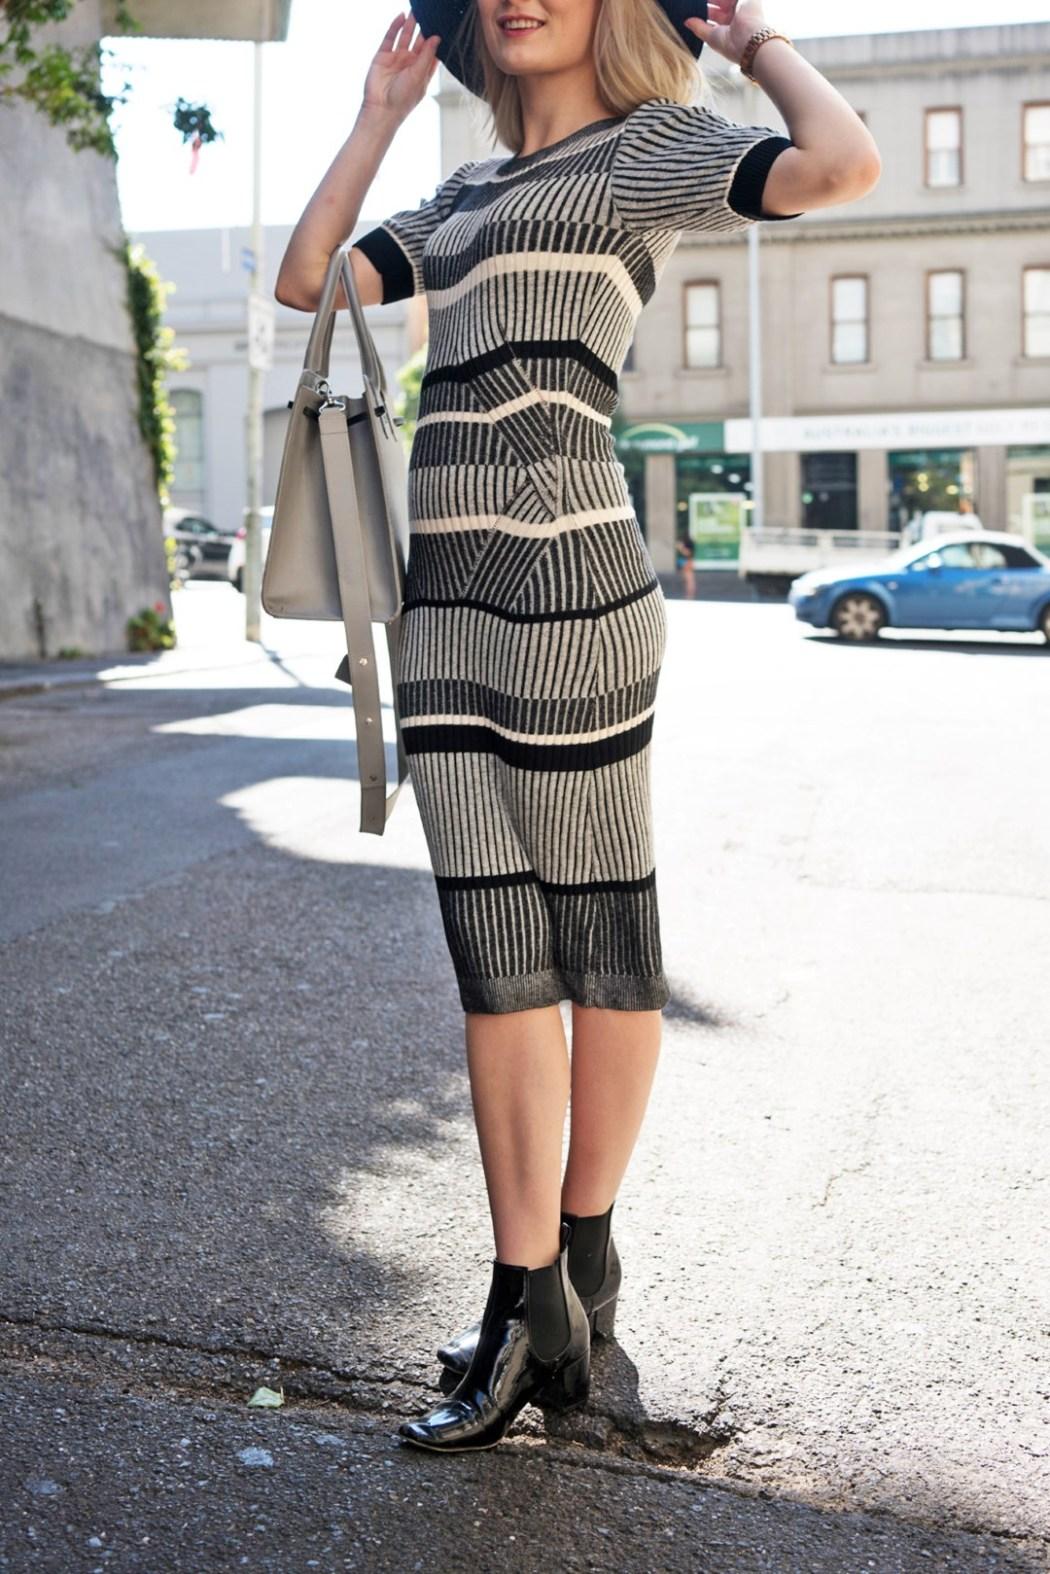 Kristen wears Lucid Label's Linear Bodycon Knit dress in Black and White.